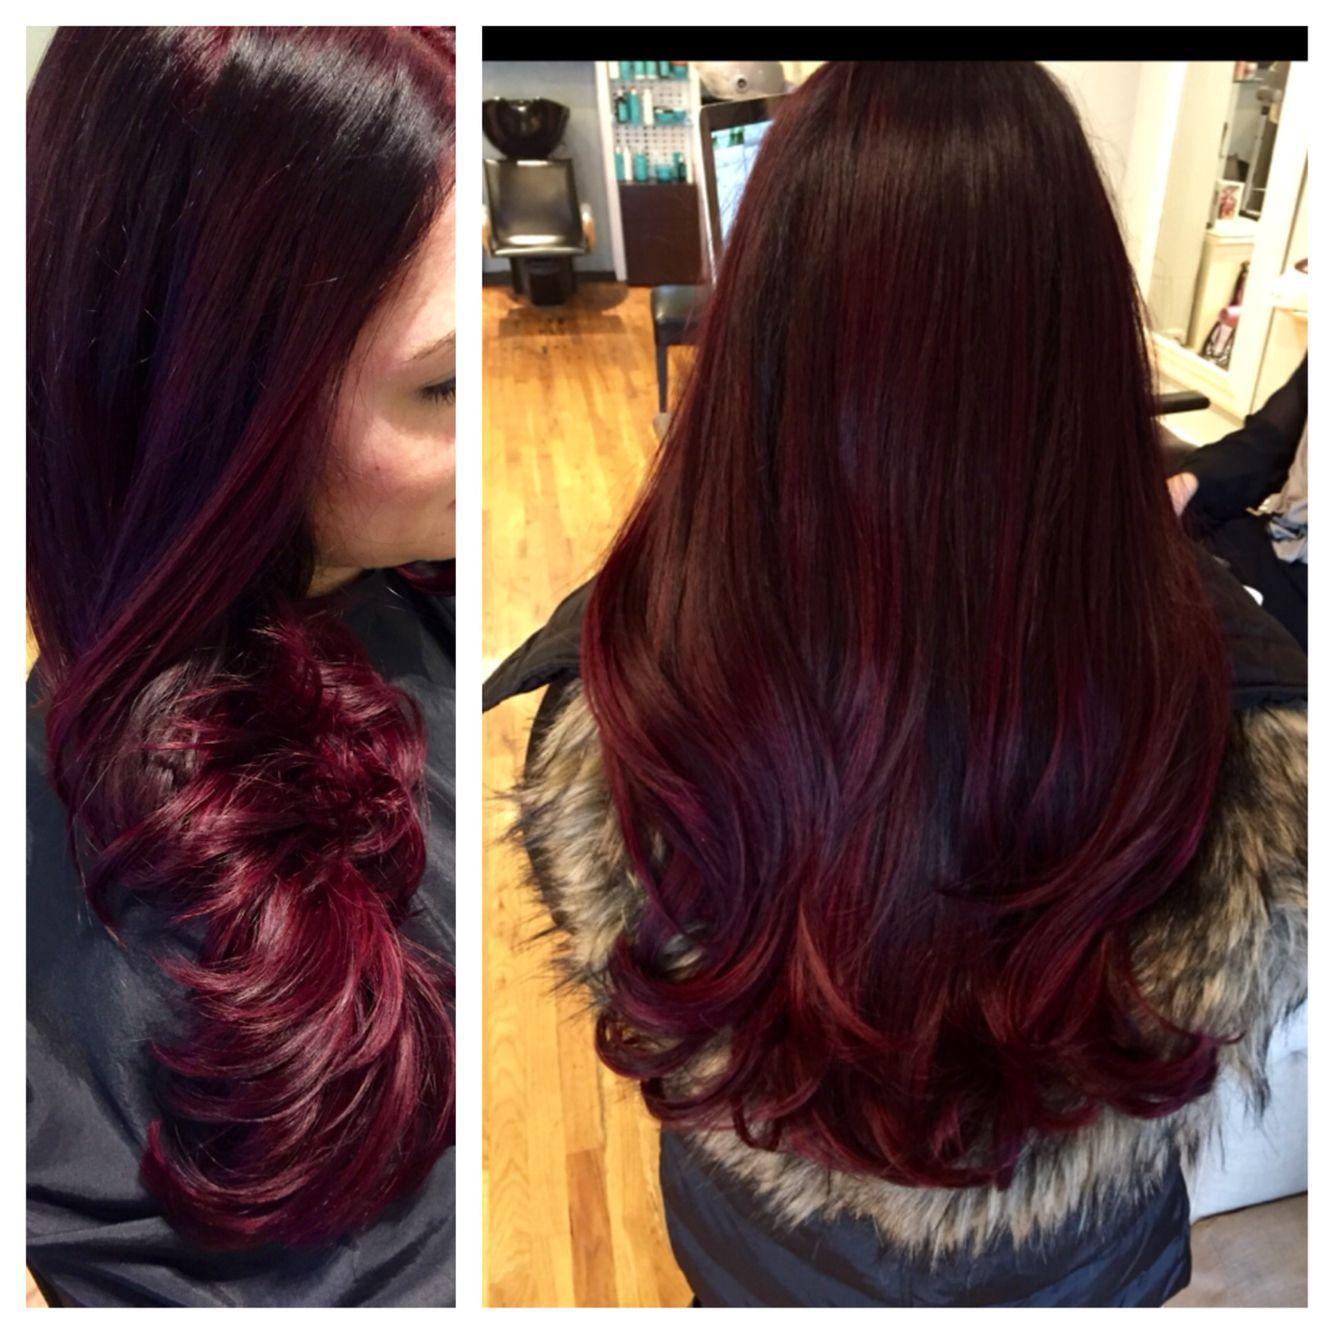 Merlot hair color - Raspberry Merlot Perfect Color For The Holidays Raspberrymerlot Merlot